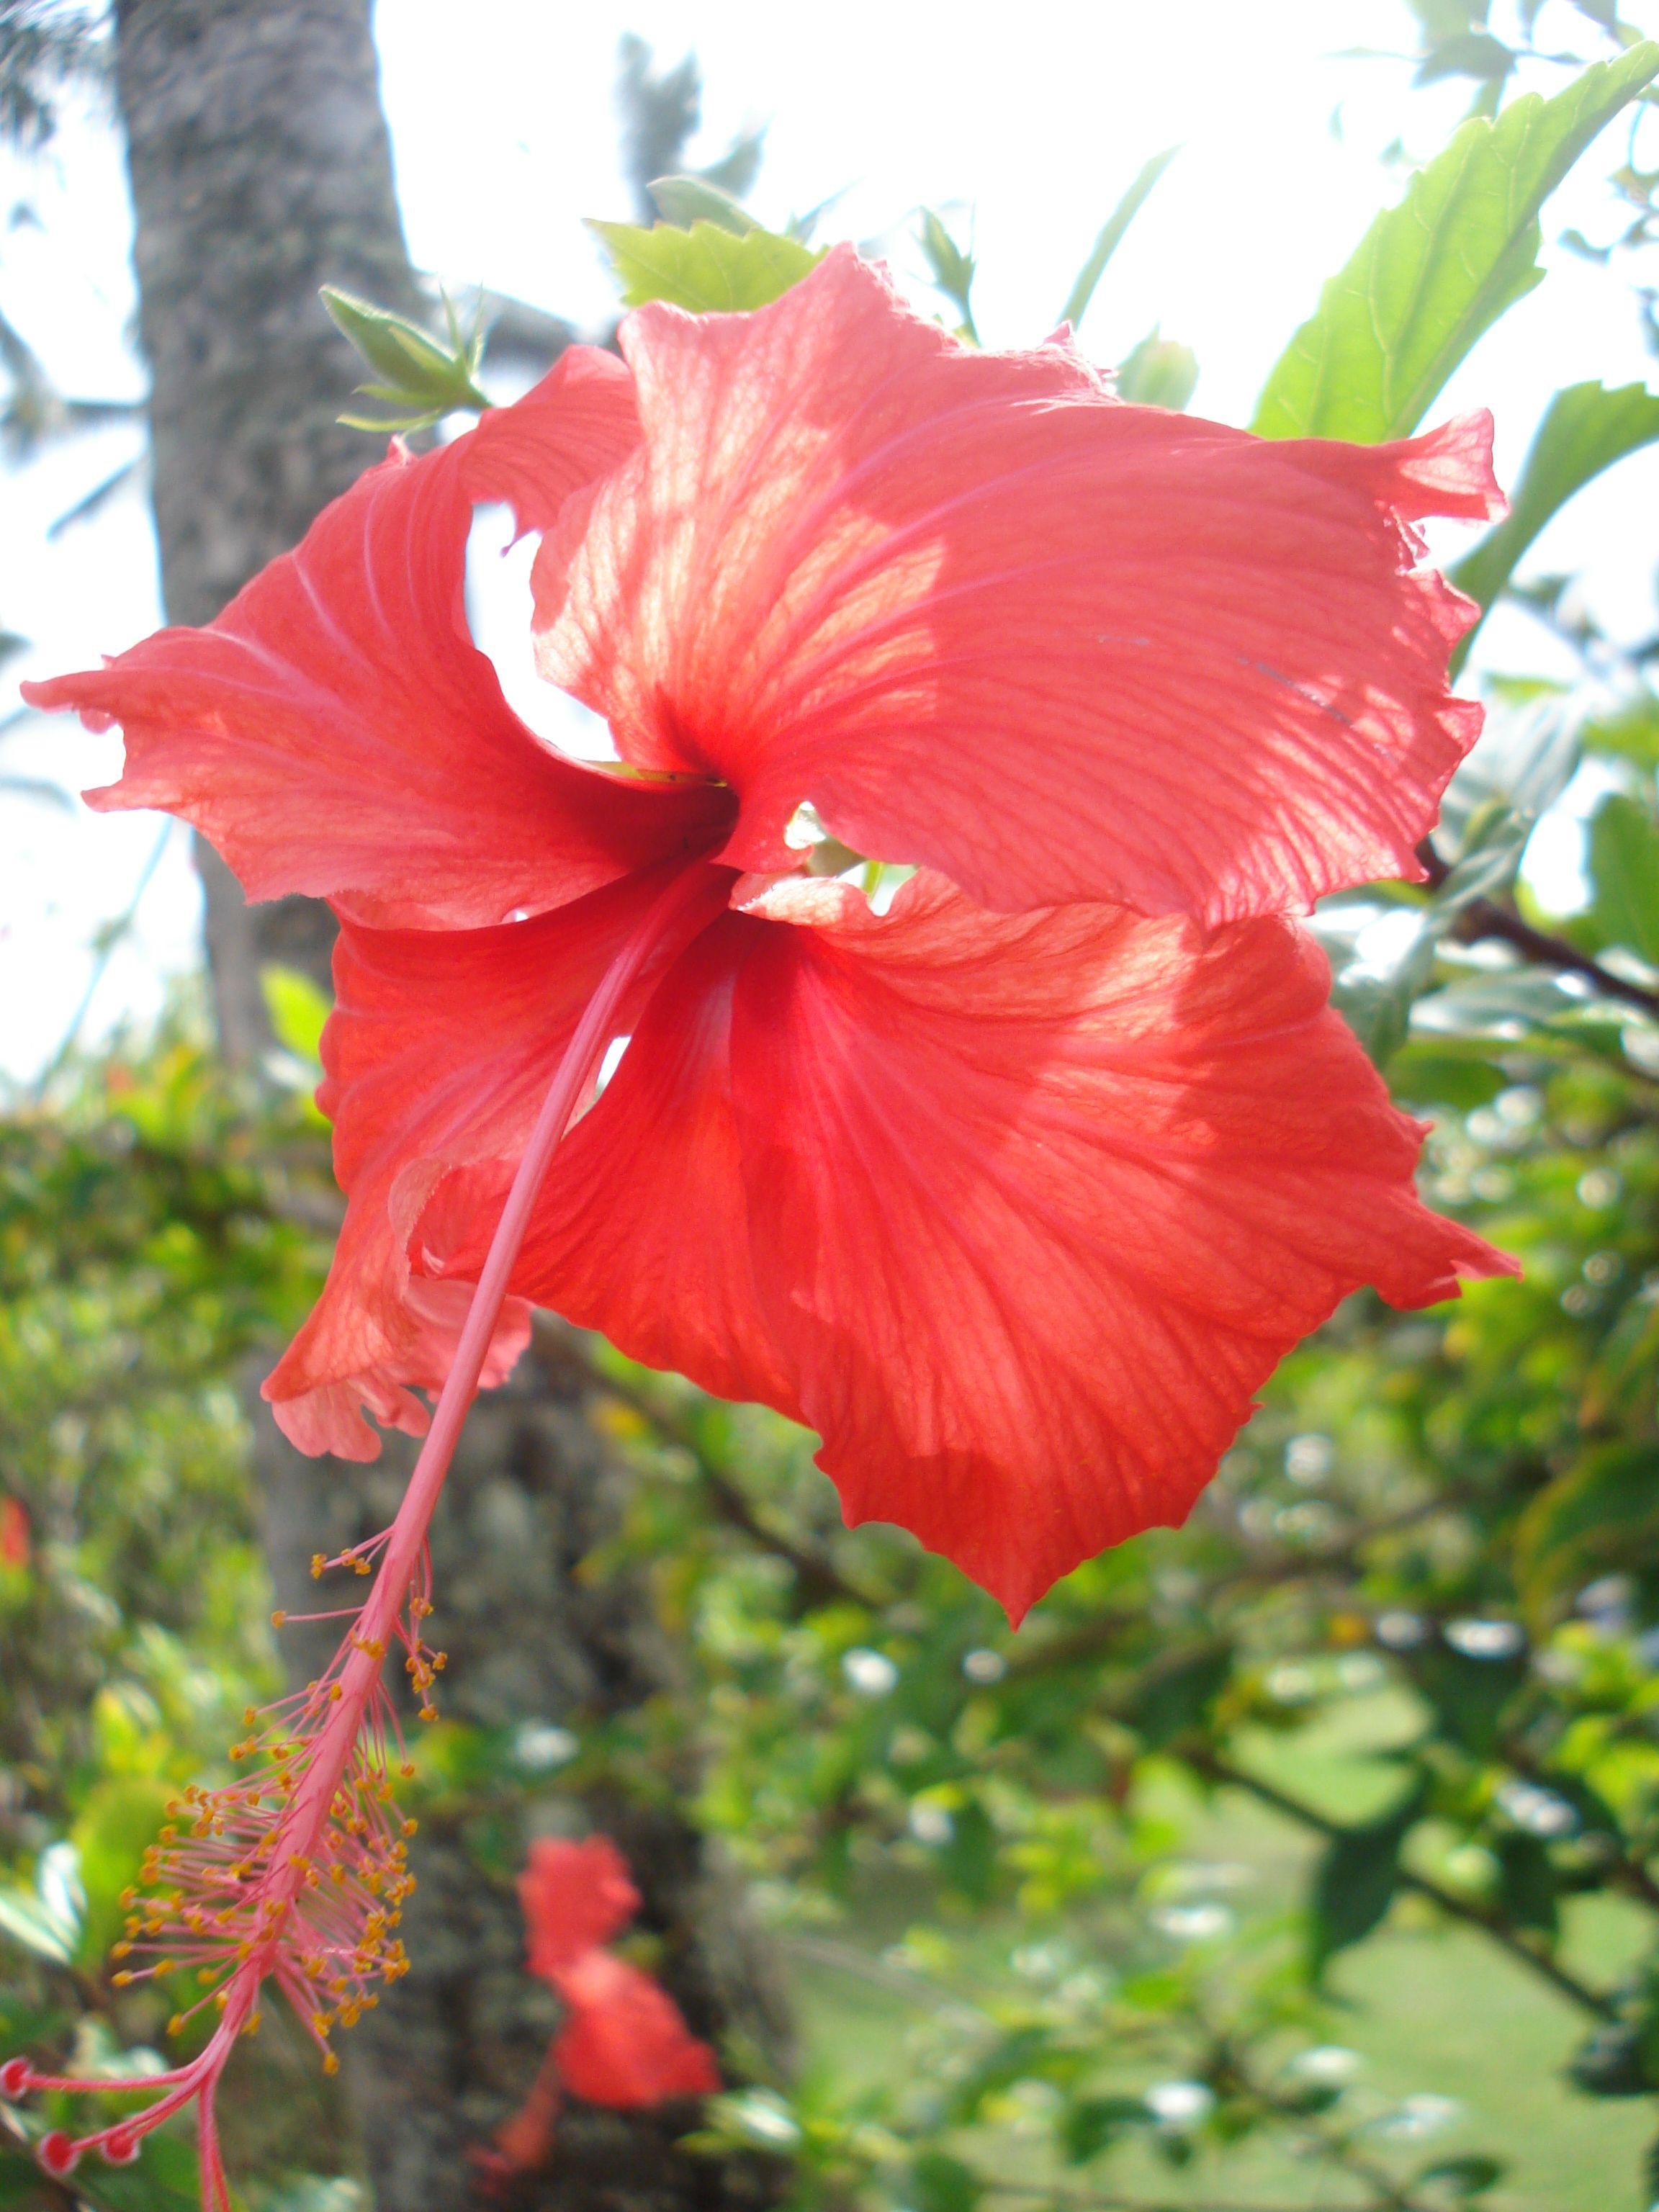 Pin By Kristin Brink On Love Flowers Pinterest Hawaii Hawaii